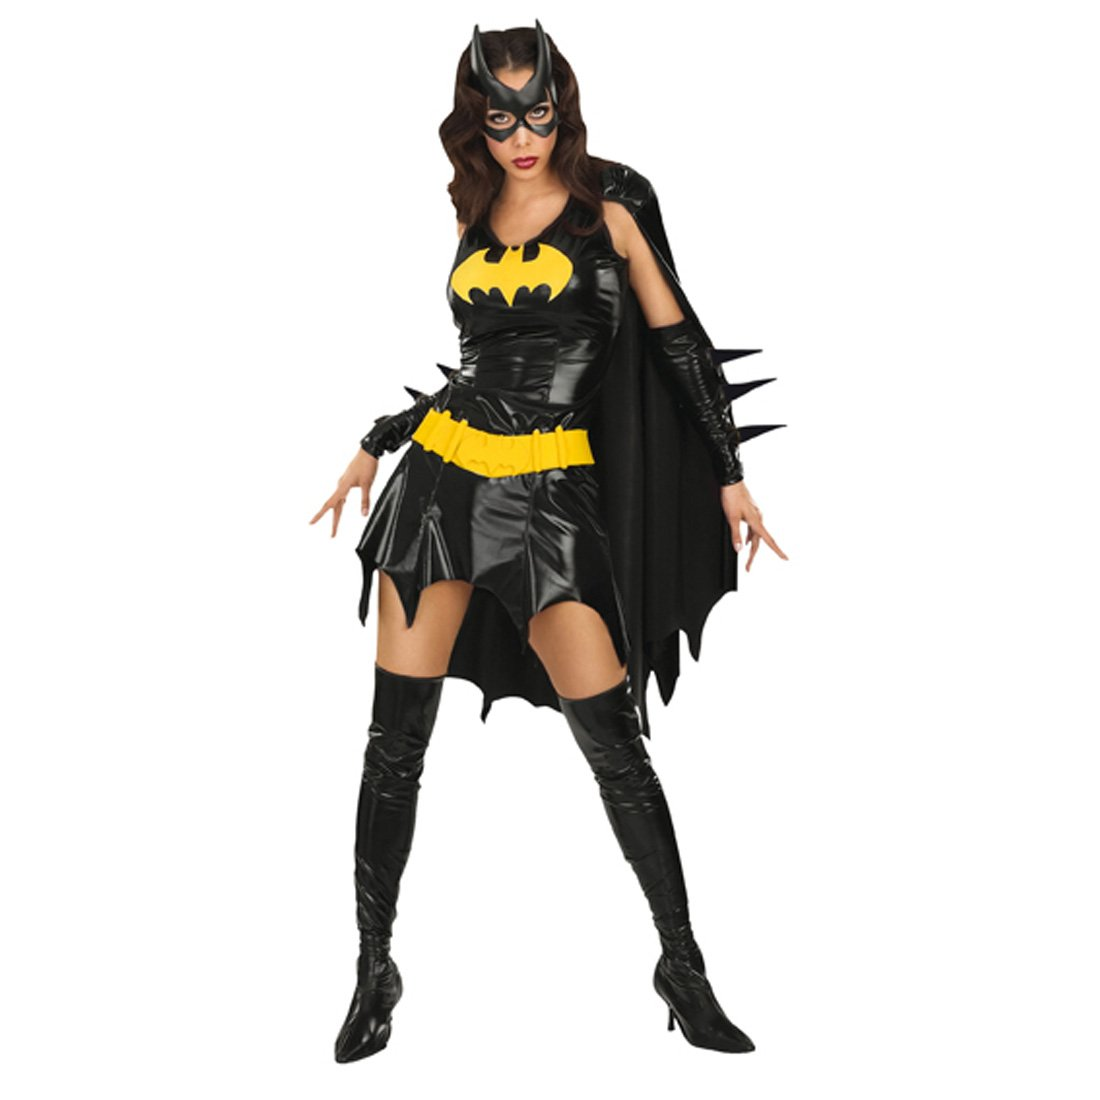 Schwarzes Batgirl Kostüm L 42/44 Superhelden Bat Girl Karnevalkostüm Fledermaus Outfit Verkleidung Damen Frauen